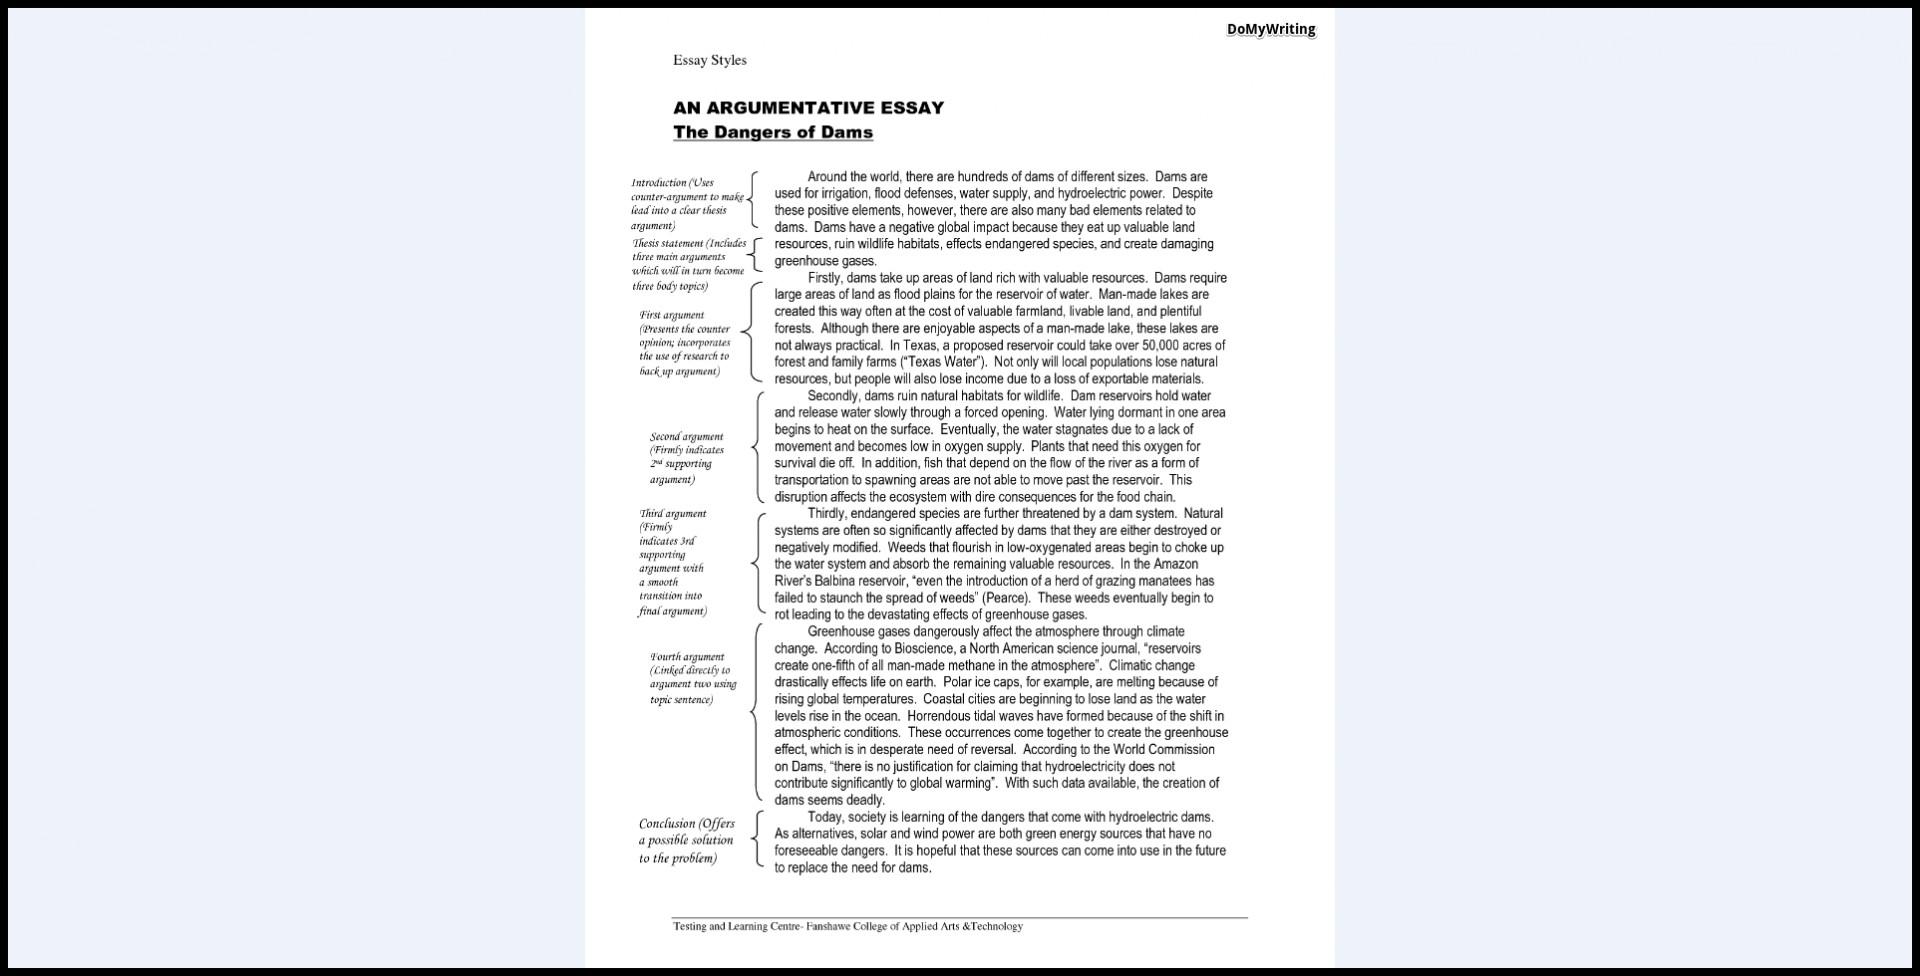 010 Essay Example Controversial Argumentative Topics Excellent Non Current 1920